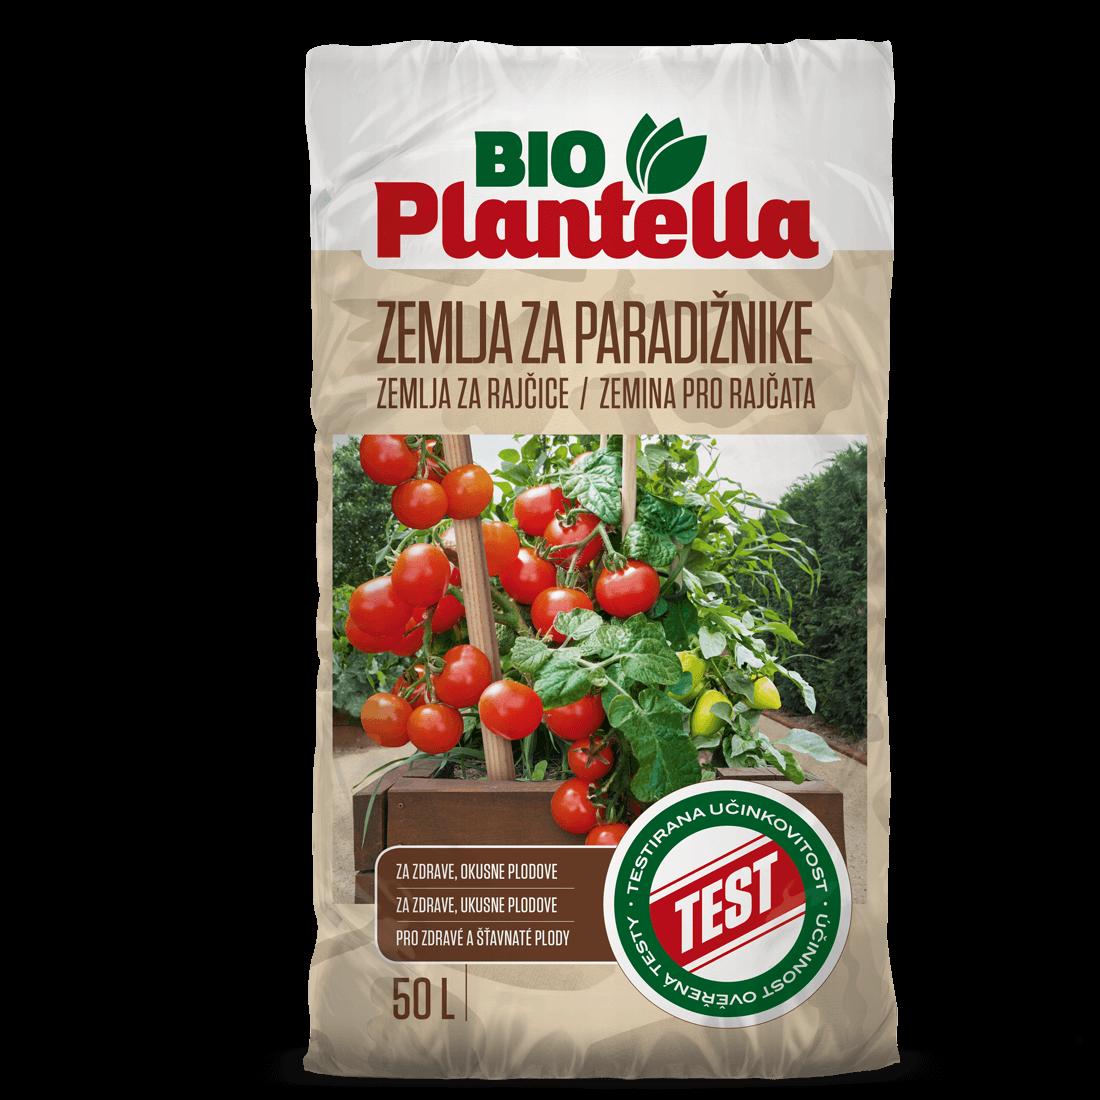 Bio-Plantella_Zemlja-paradiznike_50L_SI-HR-CZ